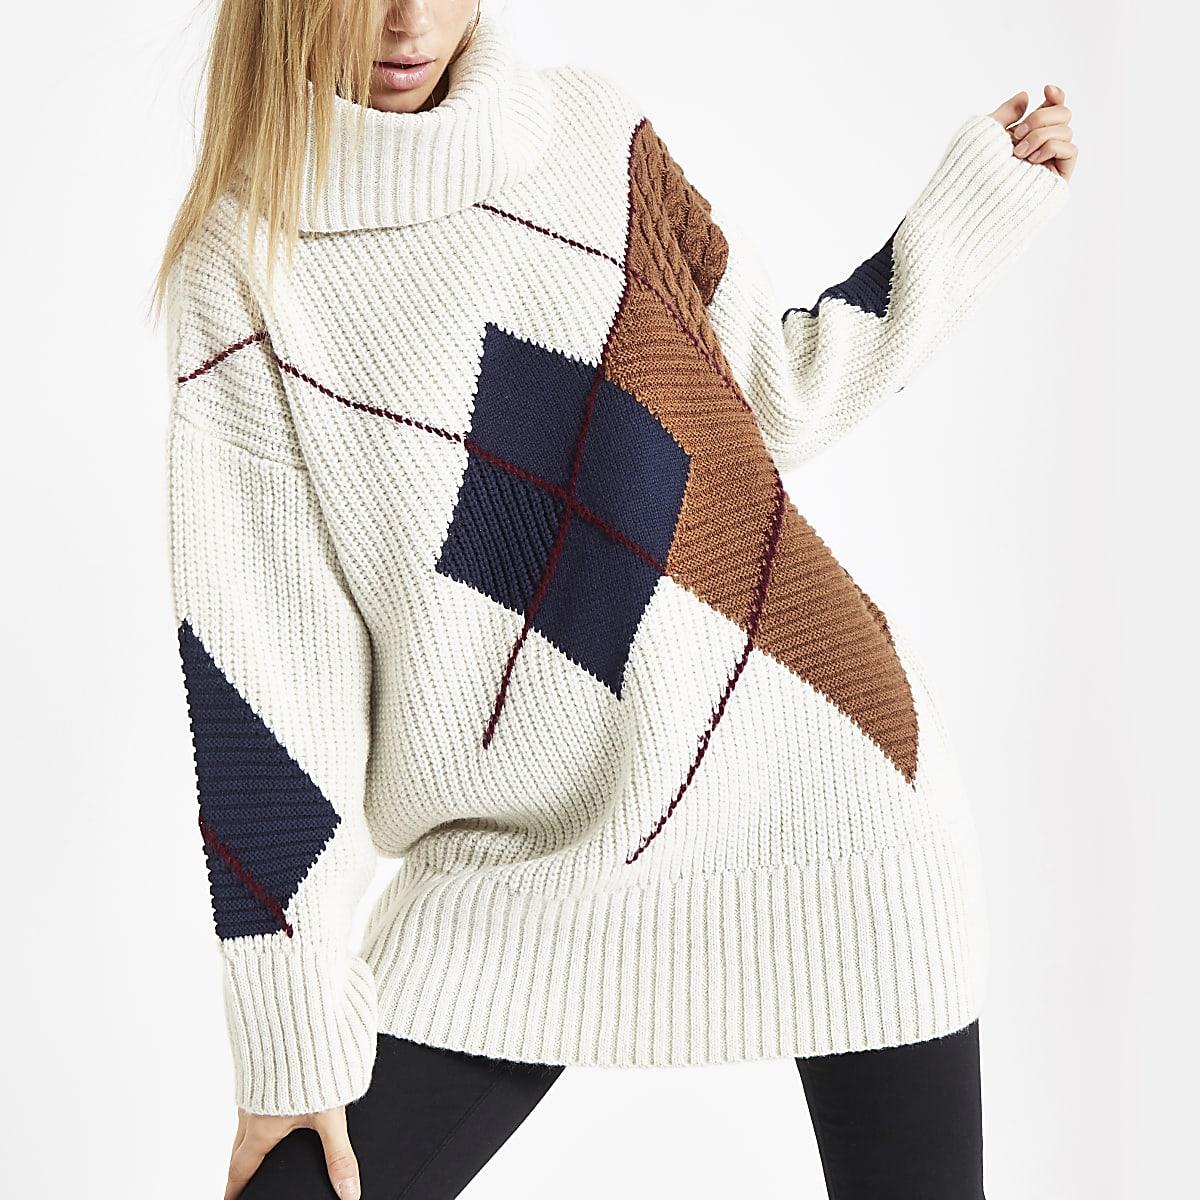 Cream argyle roll neck knit sweater